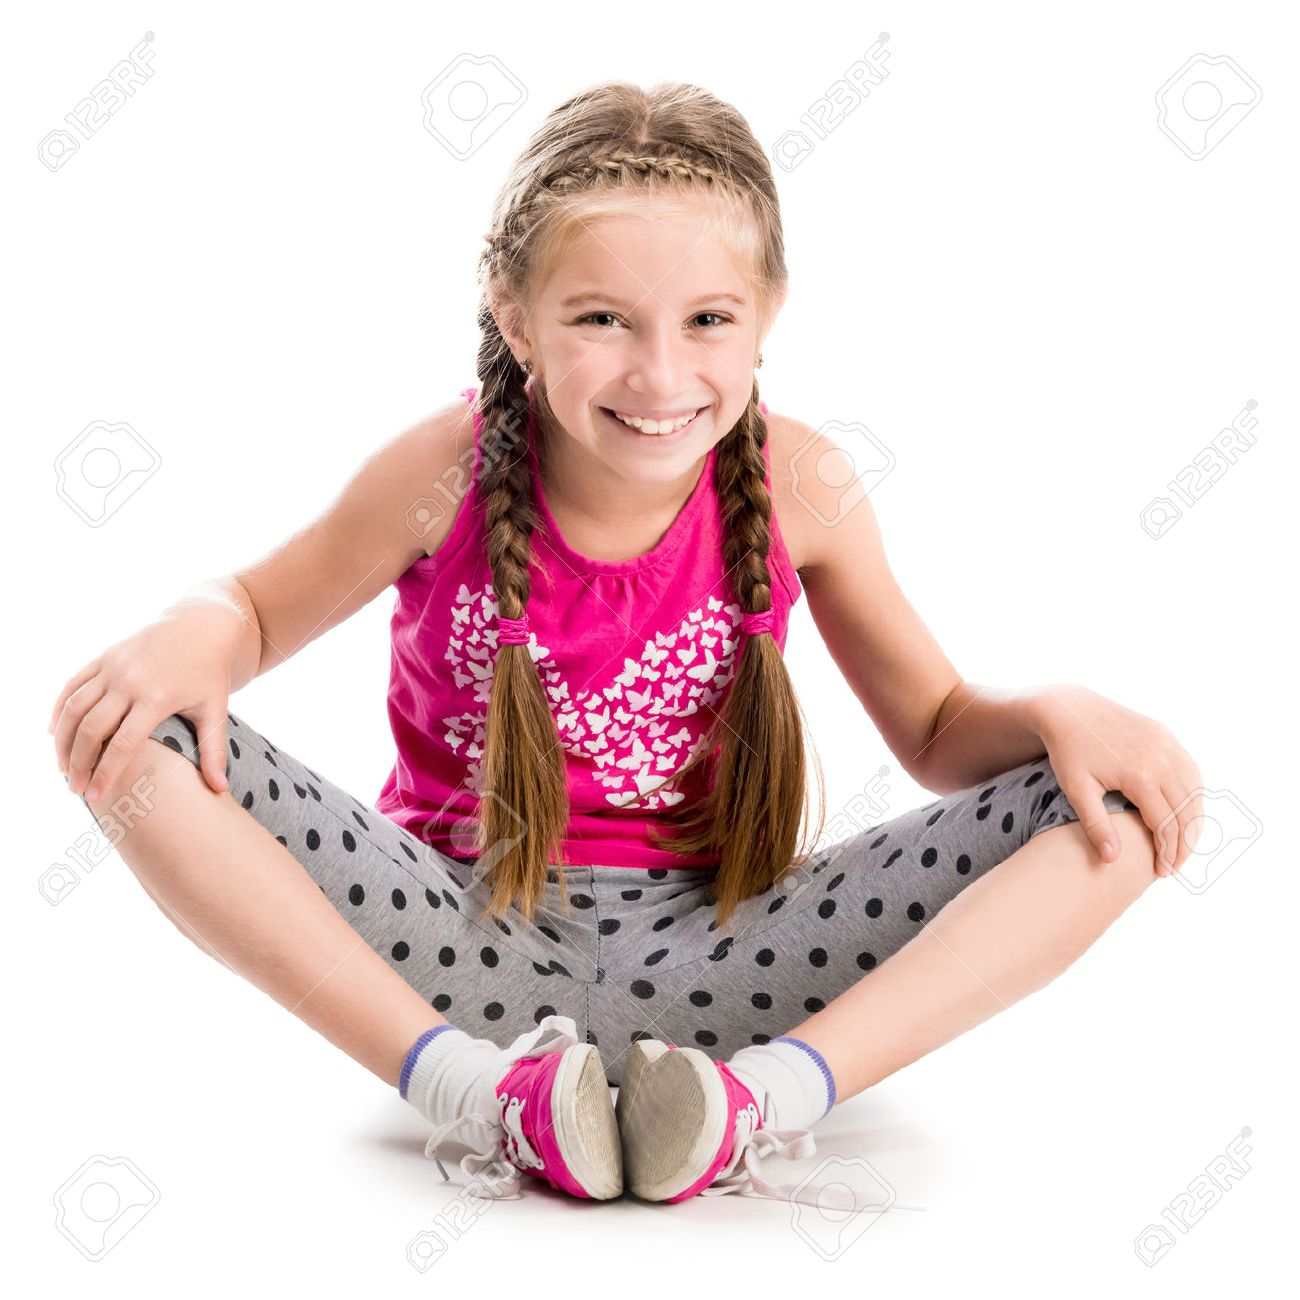 little girl doing yoga isolated on white background - 44481595